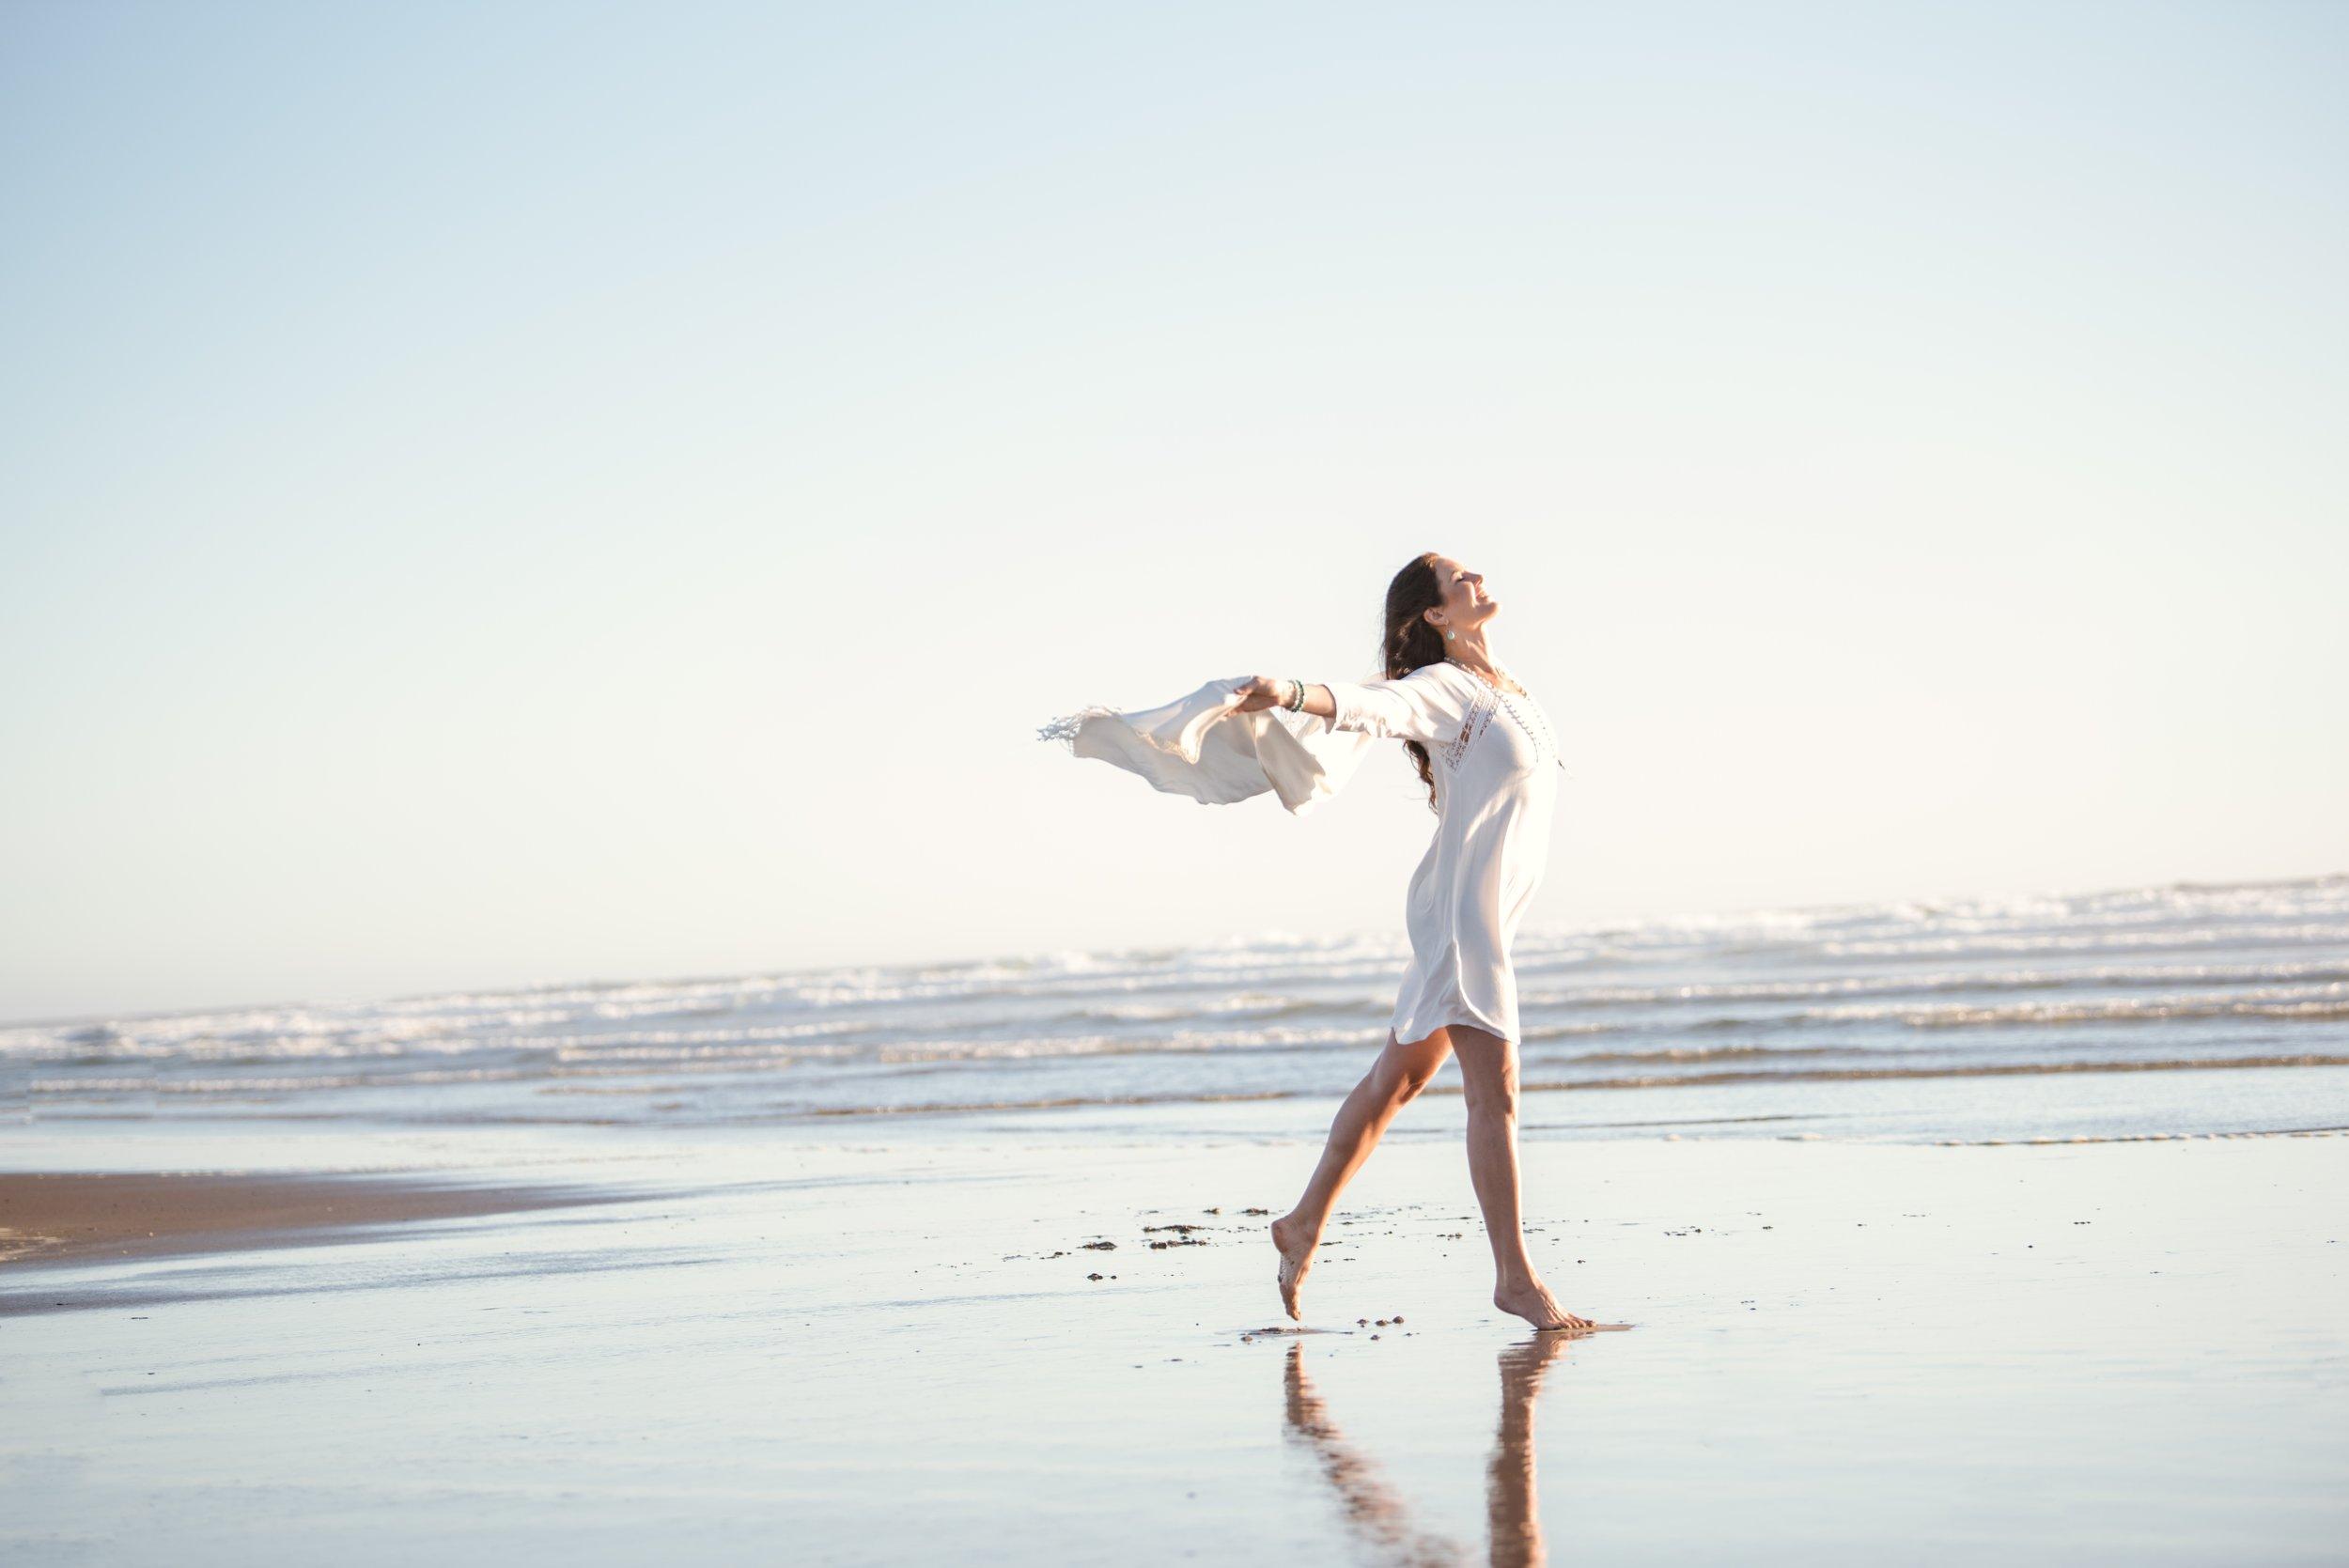 Signa beach dancing wide.jpg